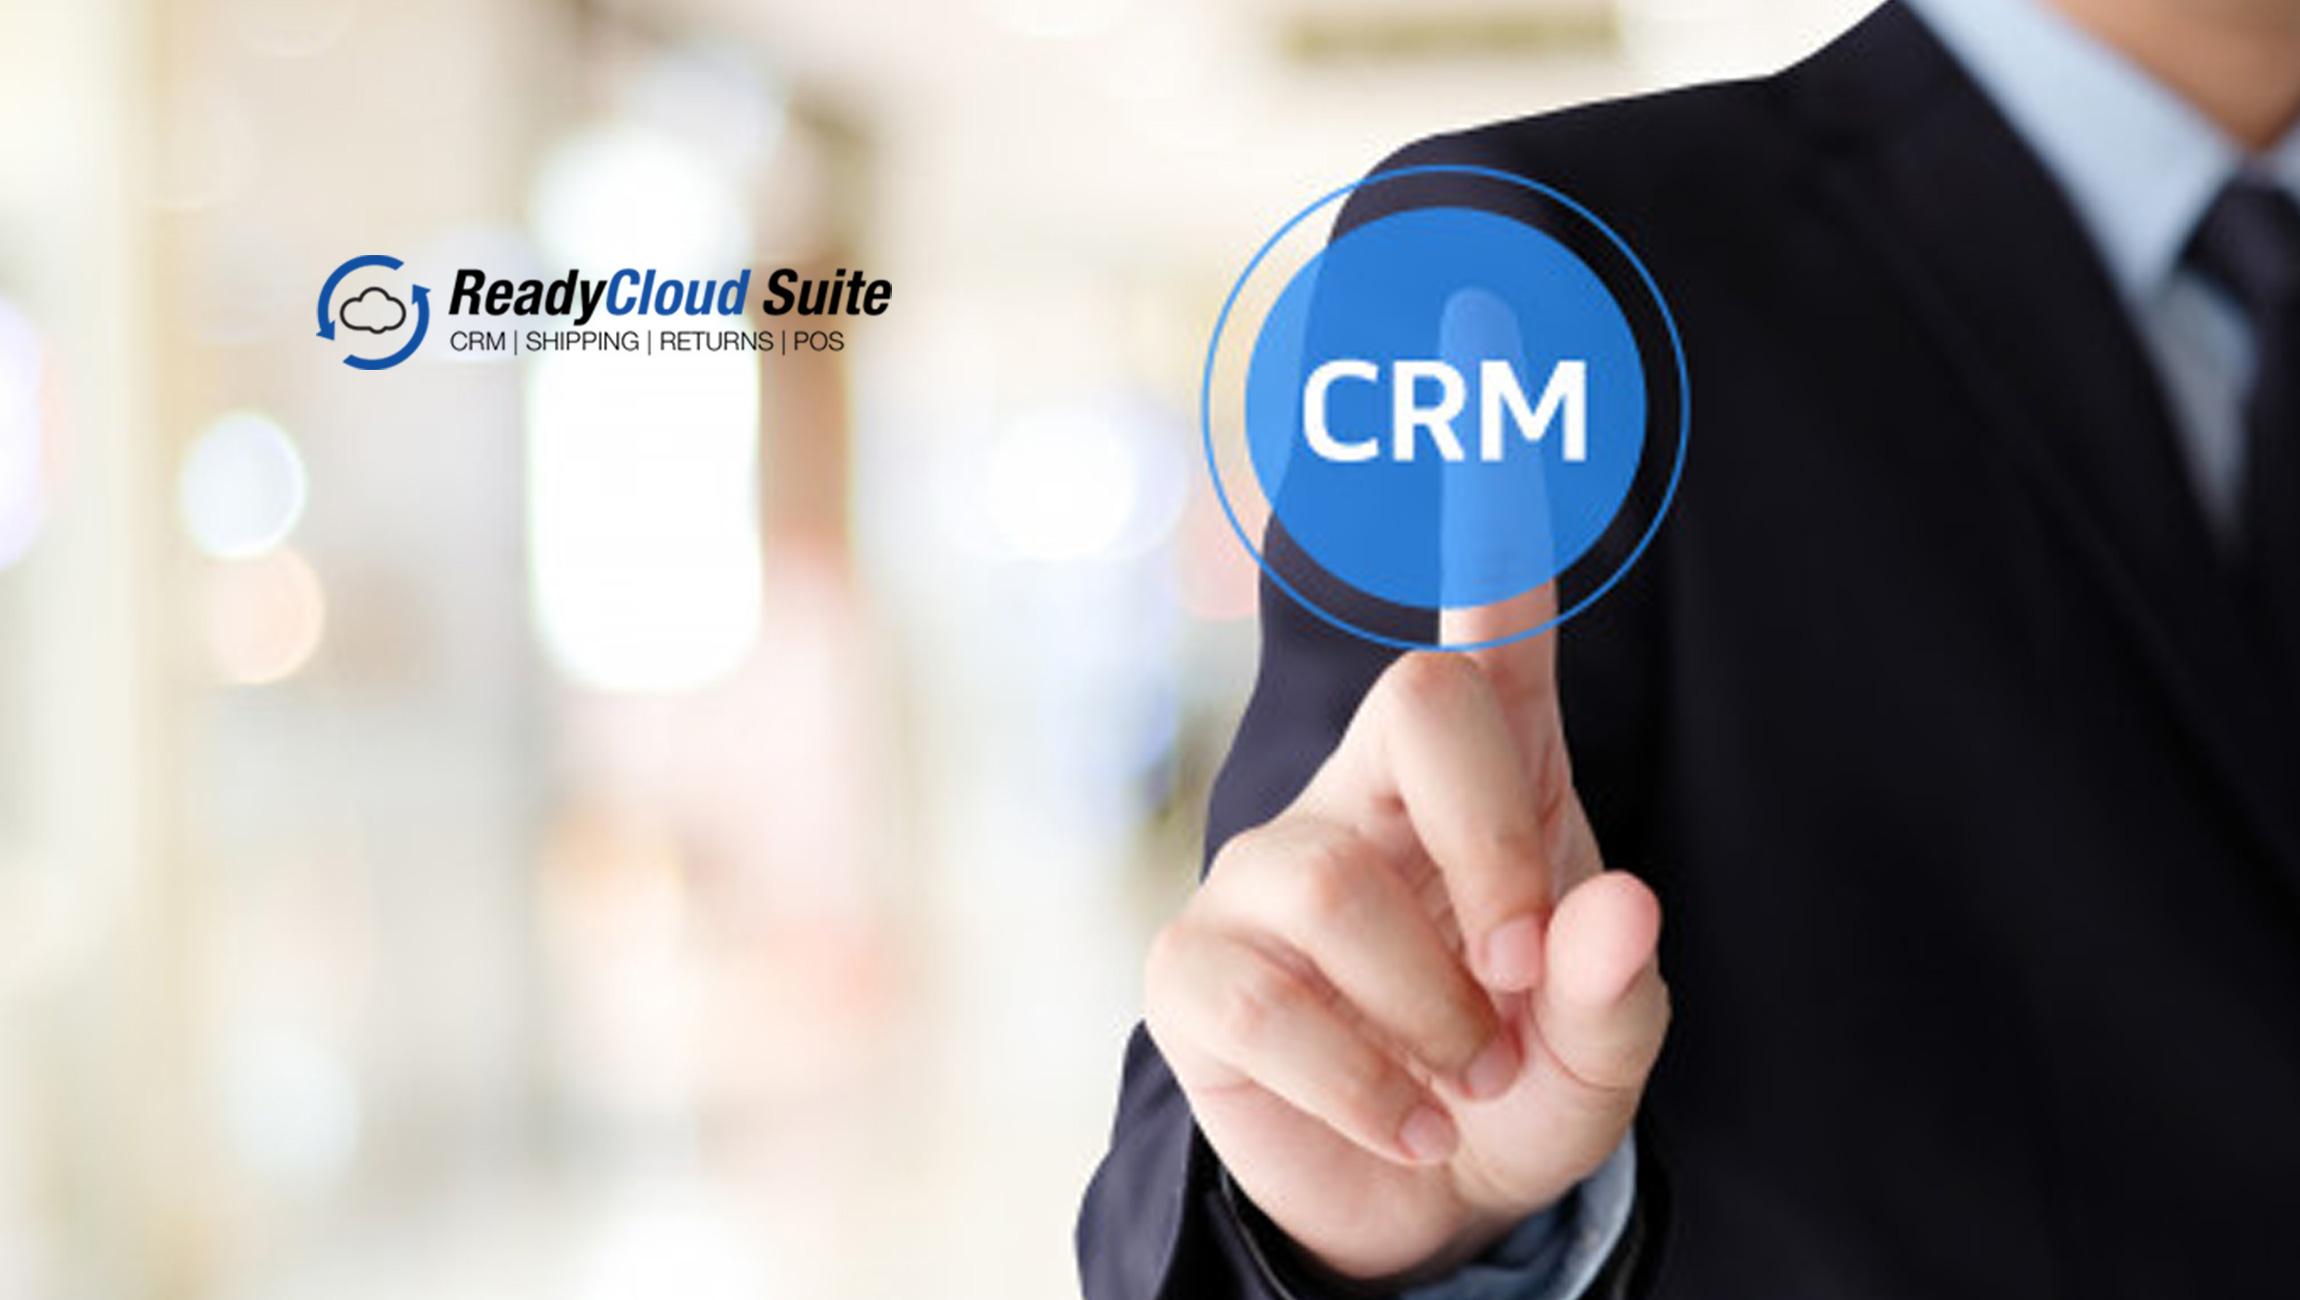 ReadyCloud CRM